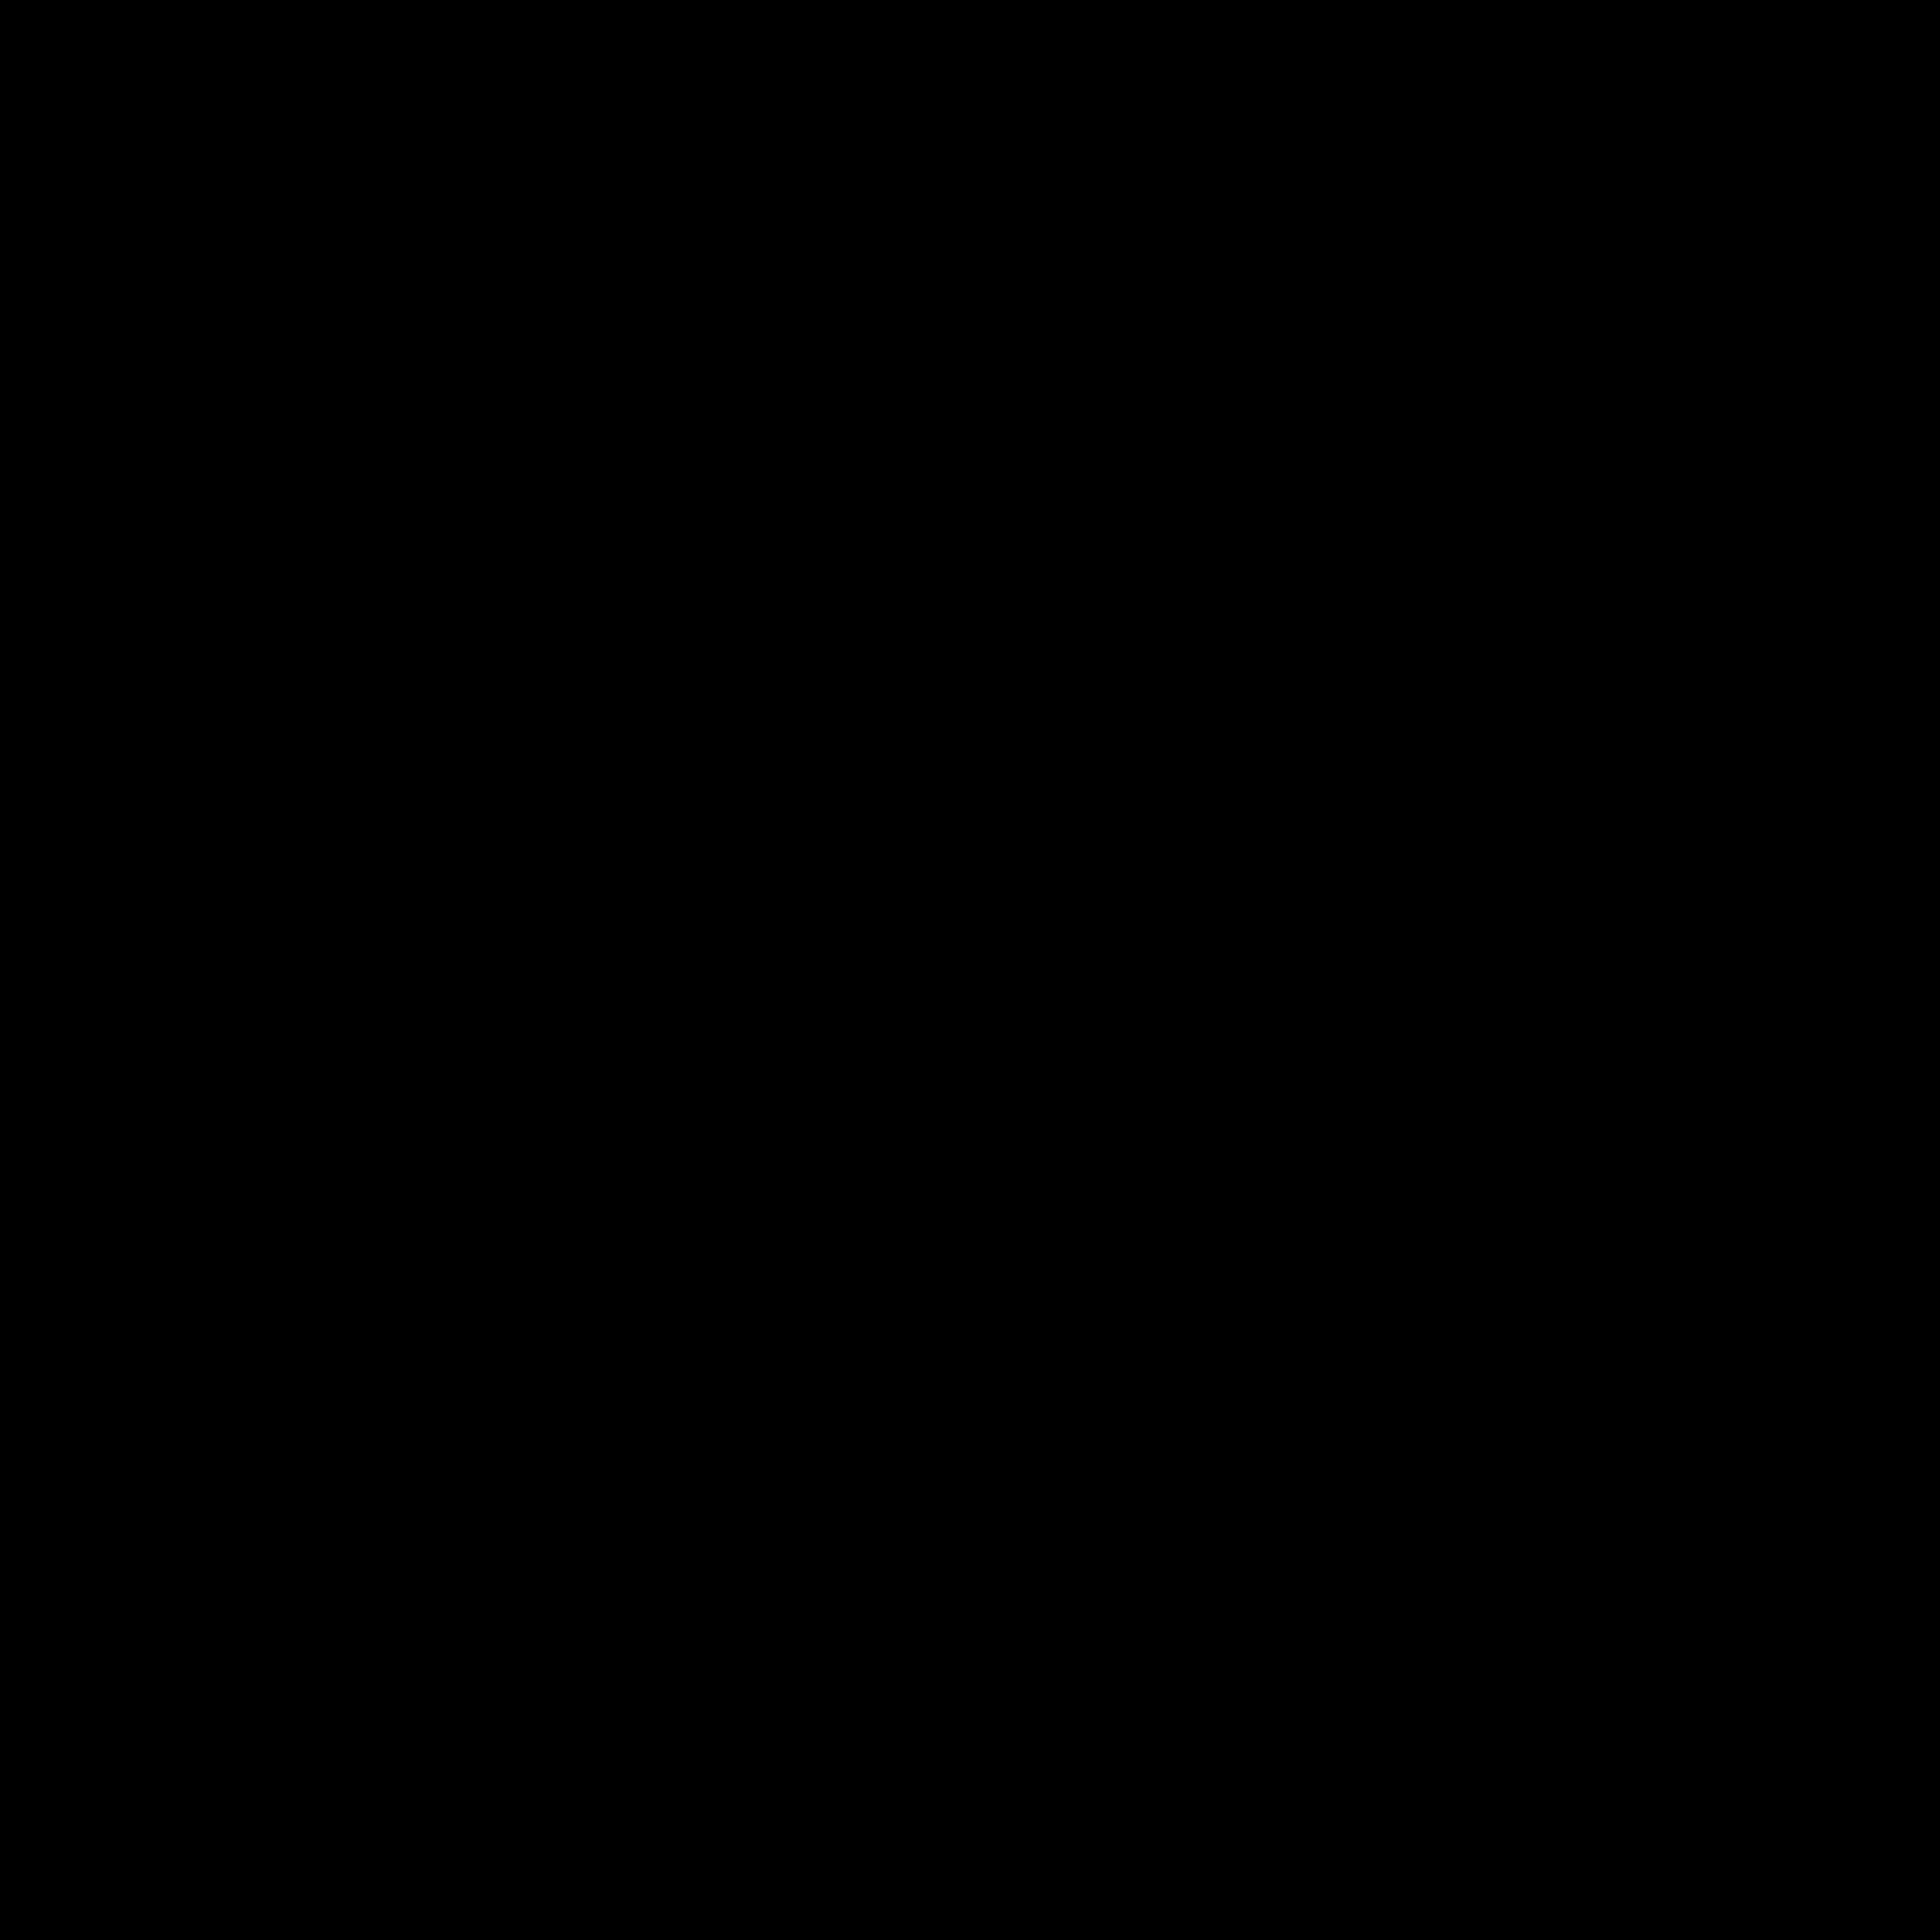 Signature de l'artiste BISHOP PARIGO